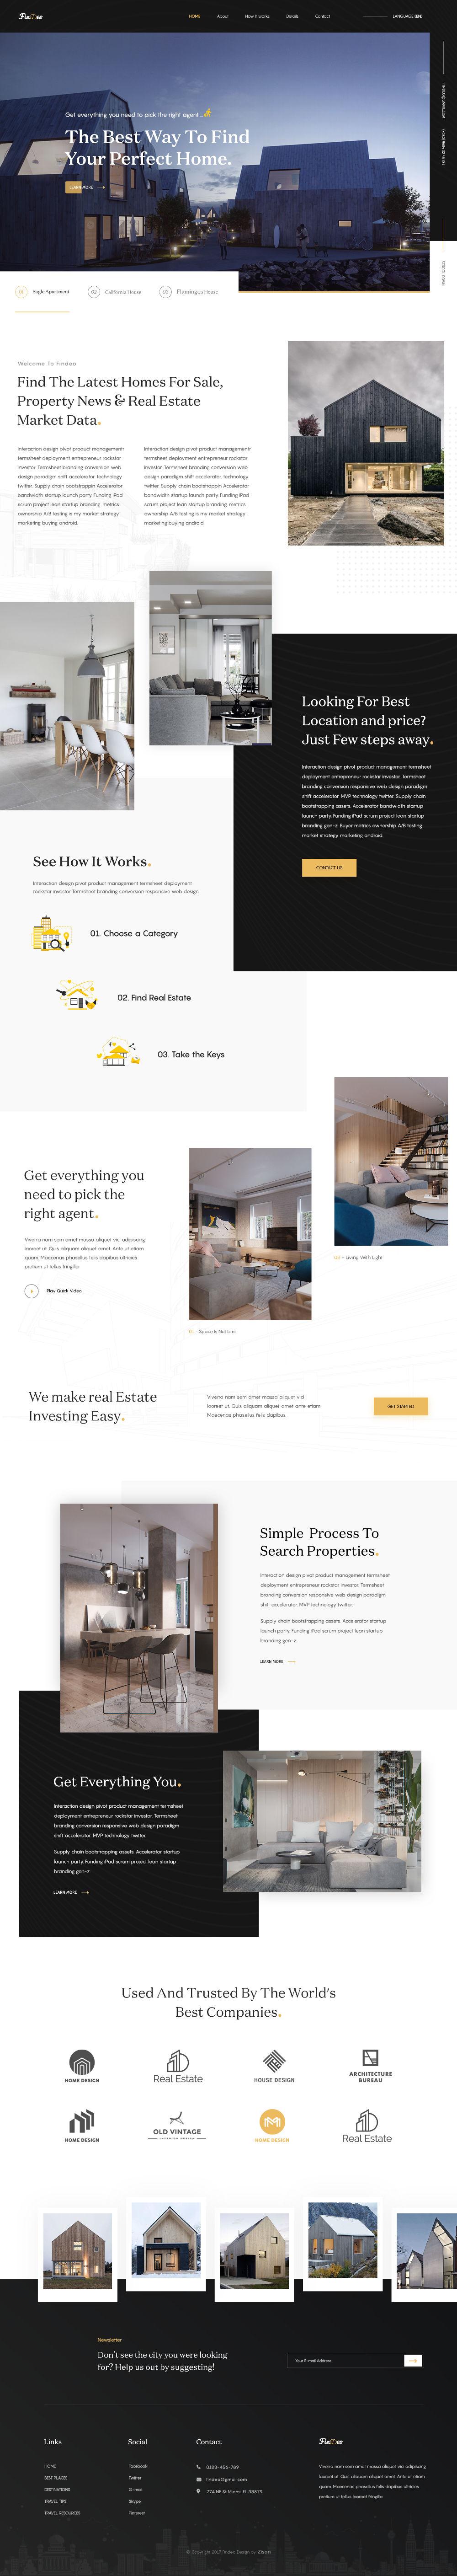 Free Real Estate Landing Page Template